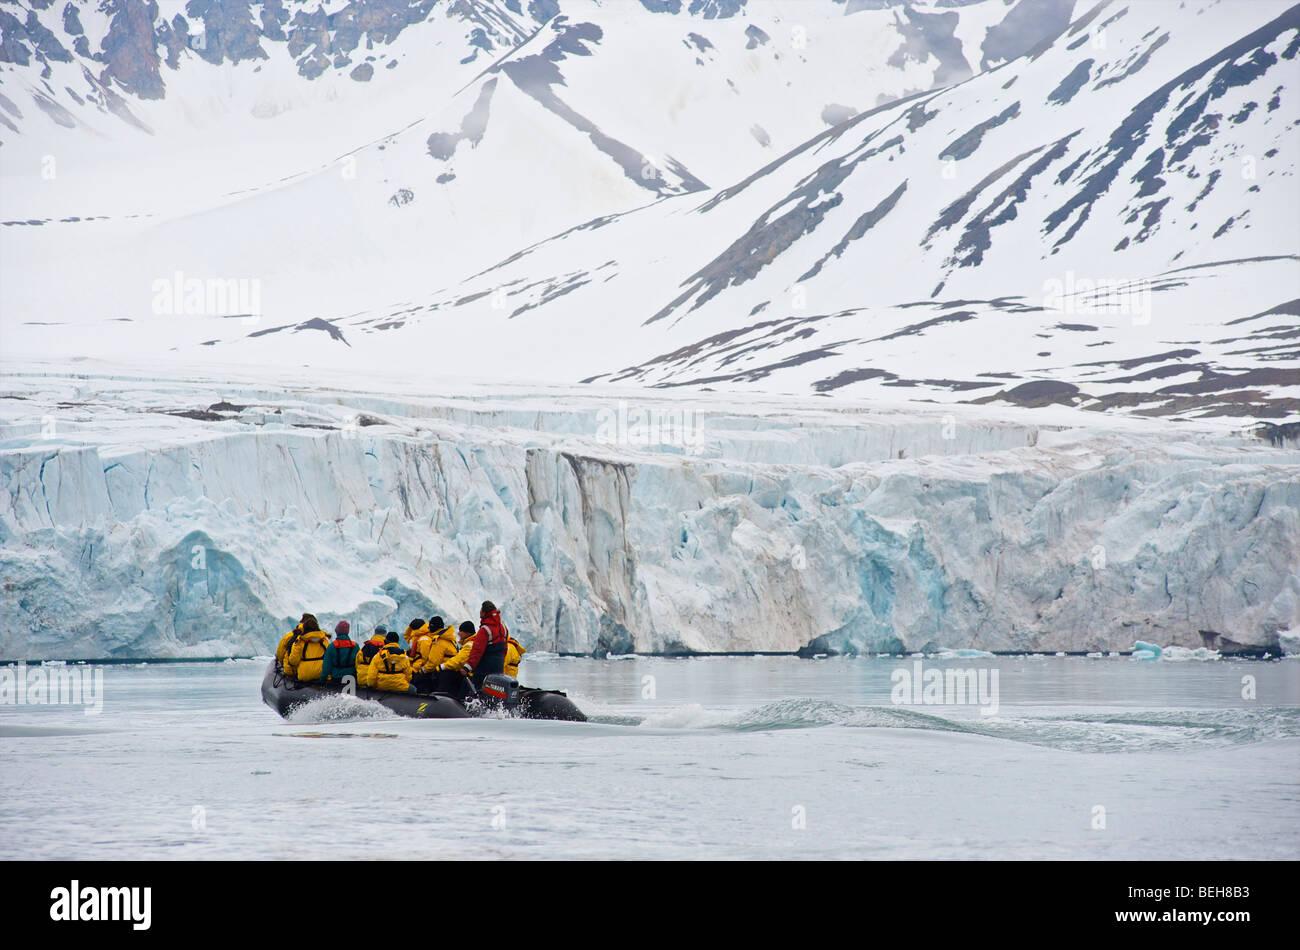 Spitsbergen, Svalbard, 14th of July glacier, zodiac cruise - Stock Image